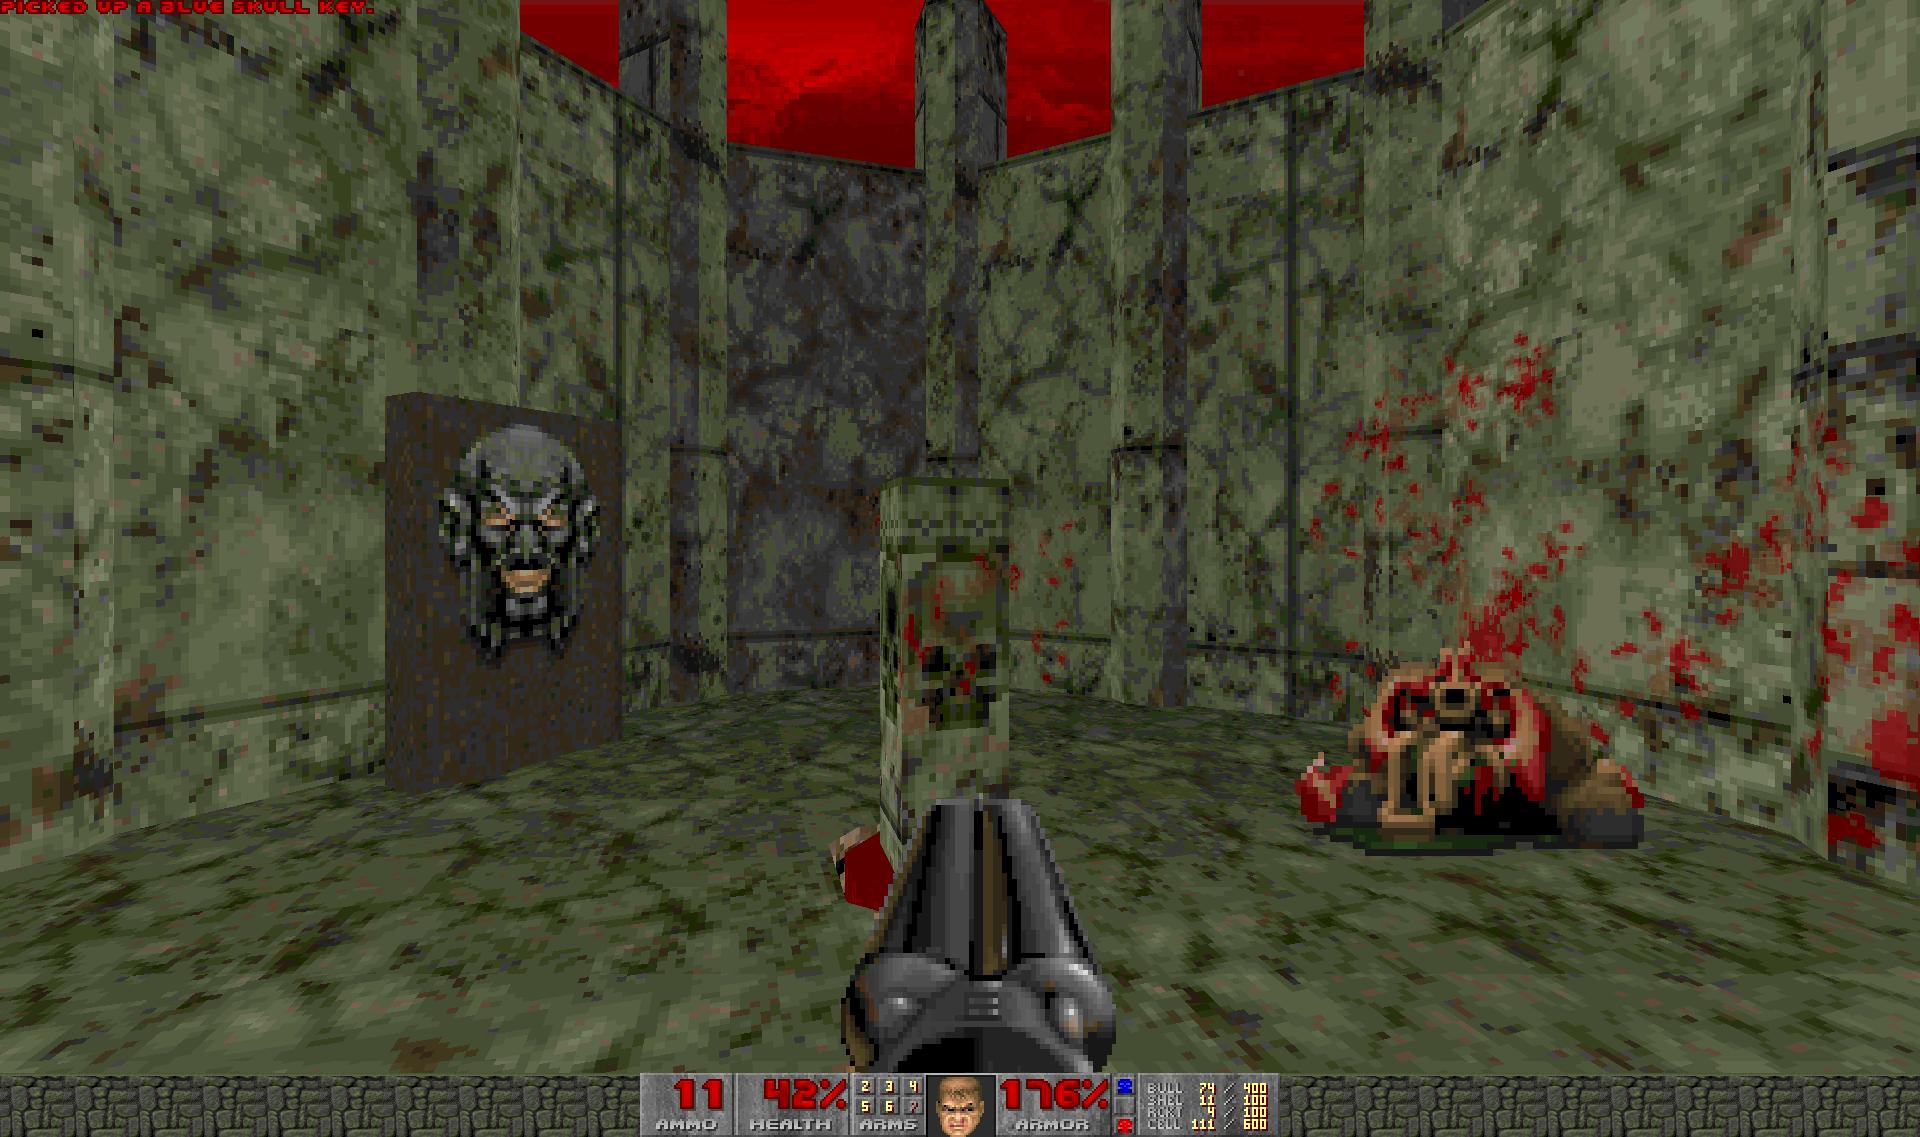 Screenshot_Doom_20210325_125130.png.b106b12b2d70d6b8a953efb679af8396.png